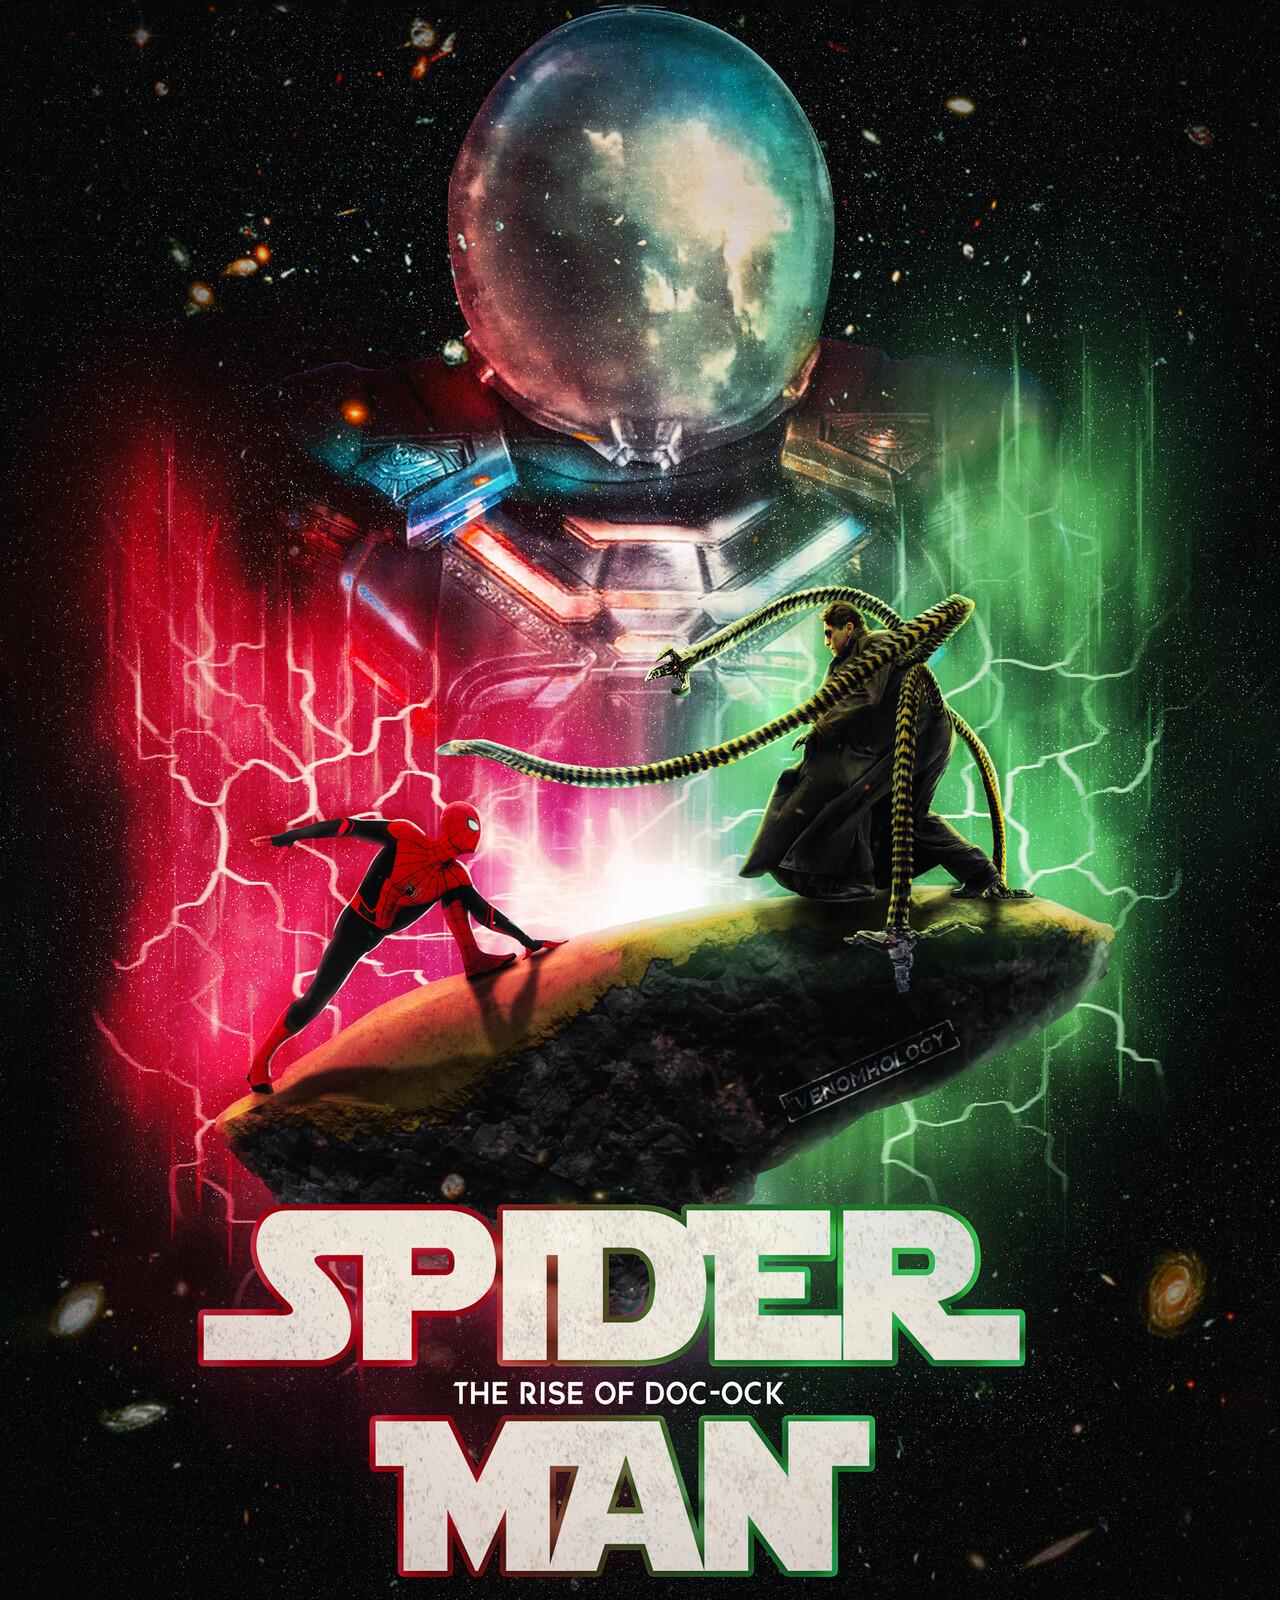 ArtStation - Spider-Man: The Rise Of Doc Ock, Hibban Mohammed